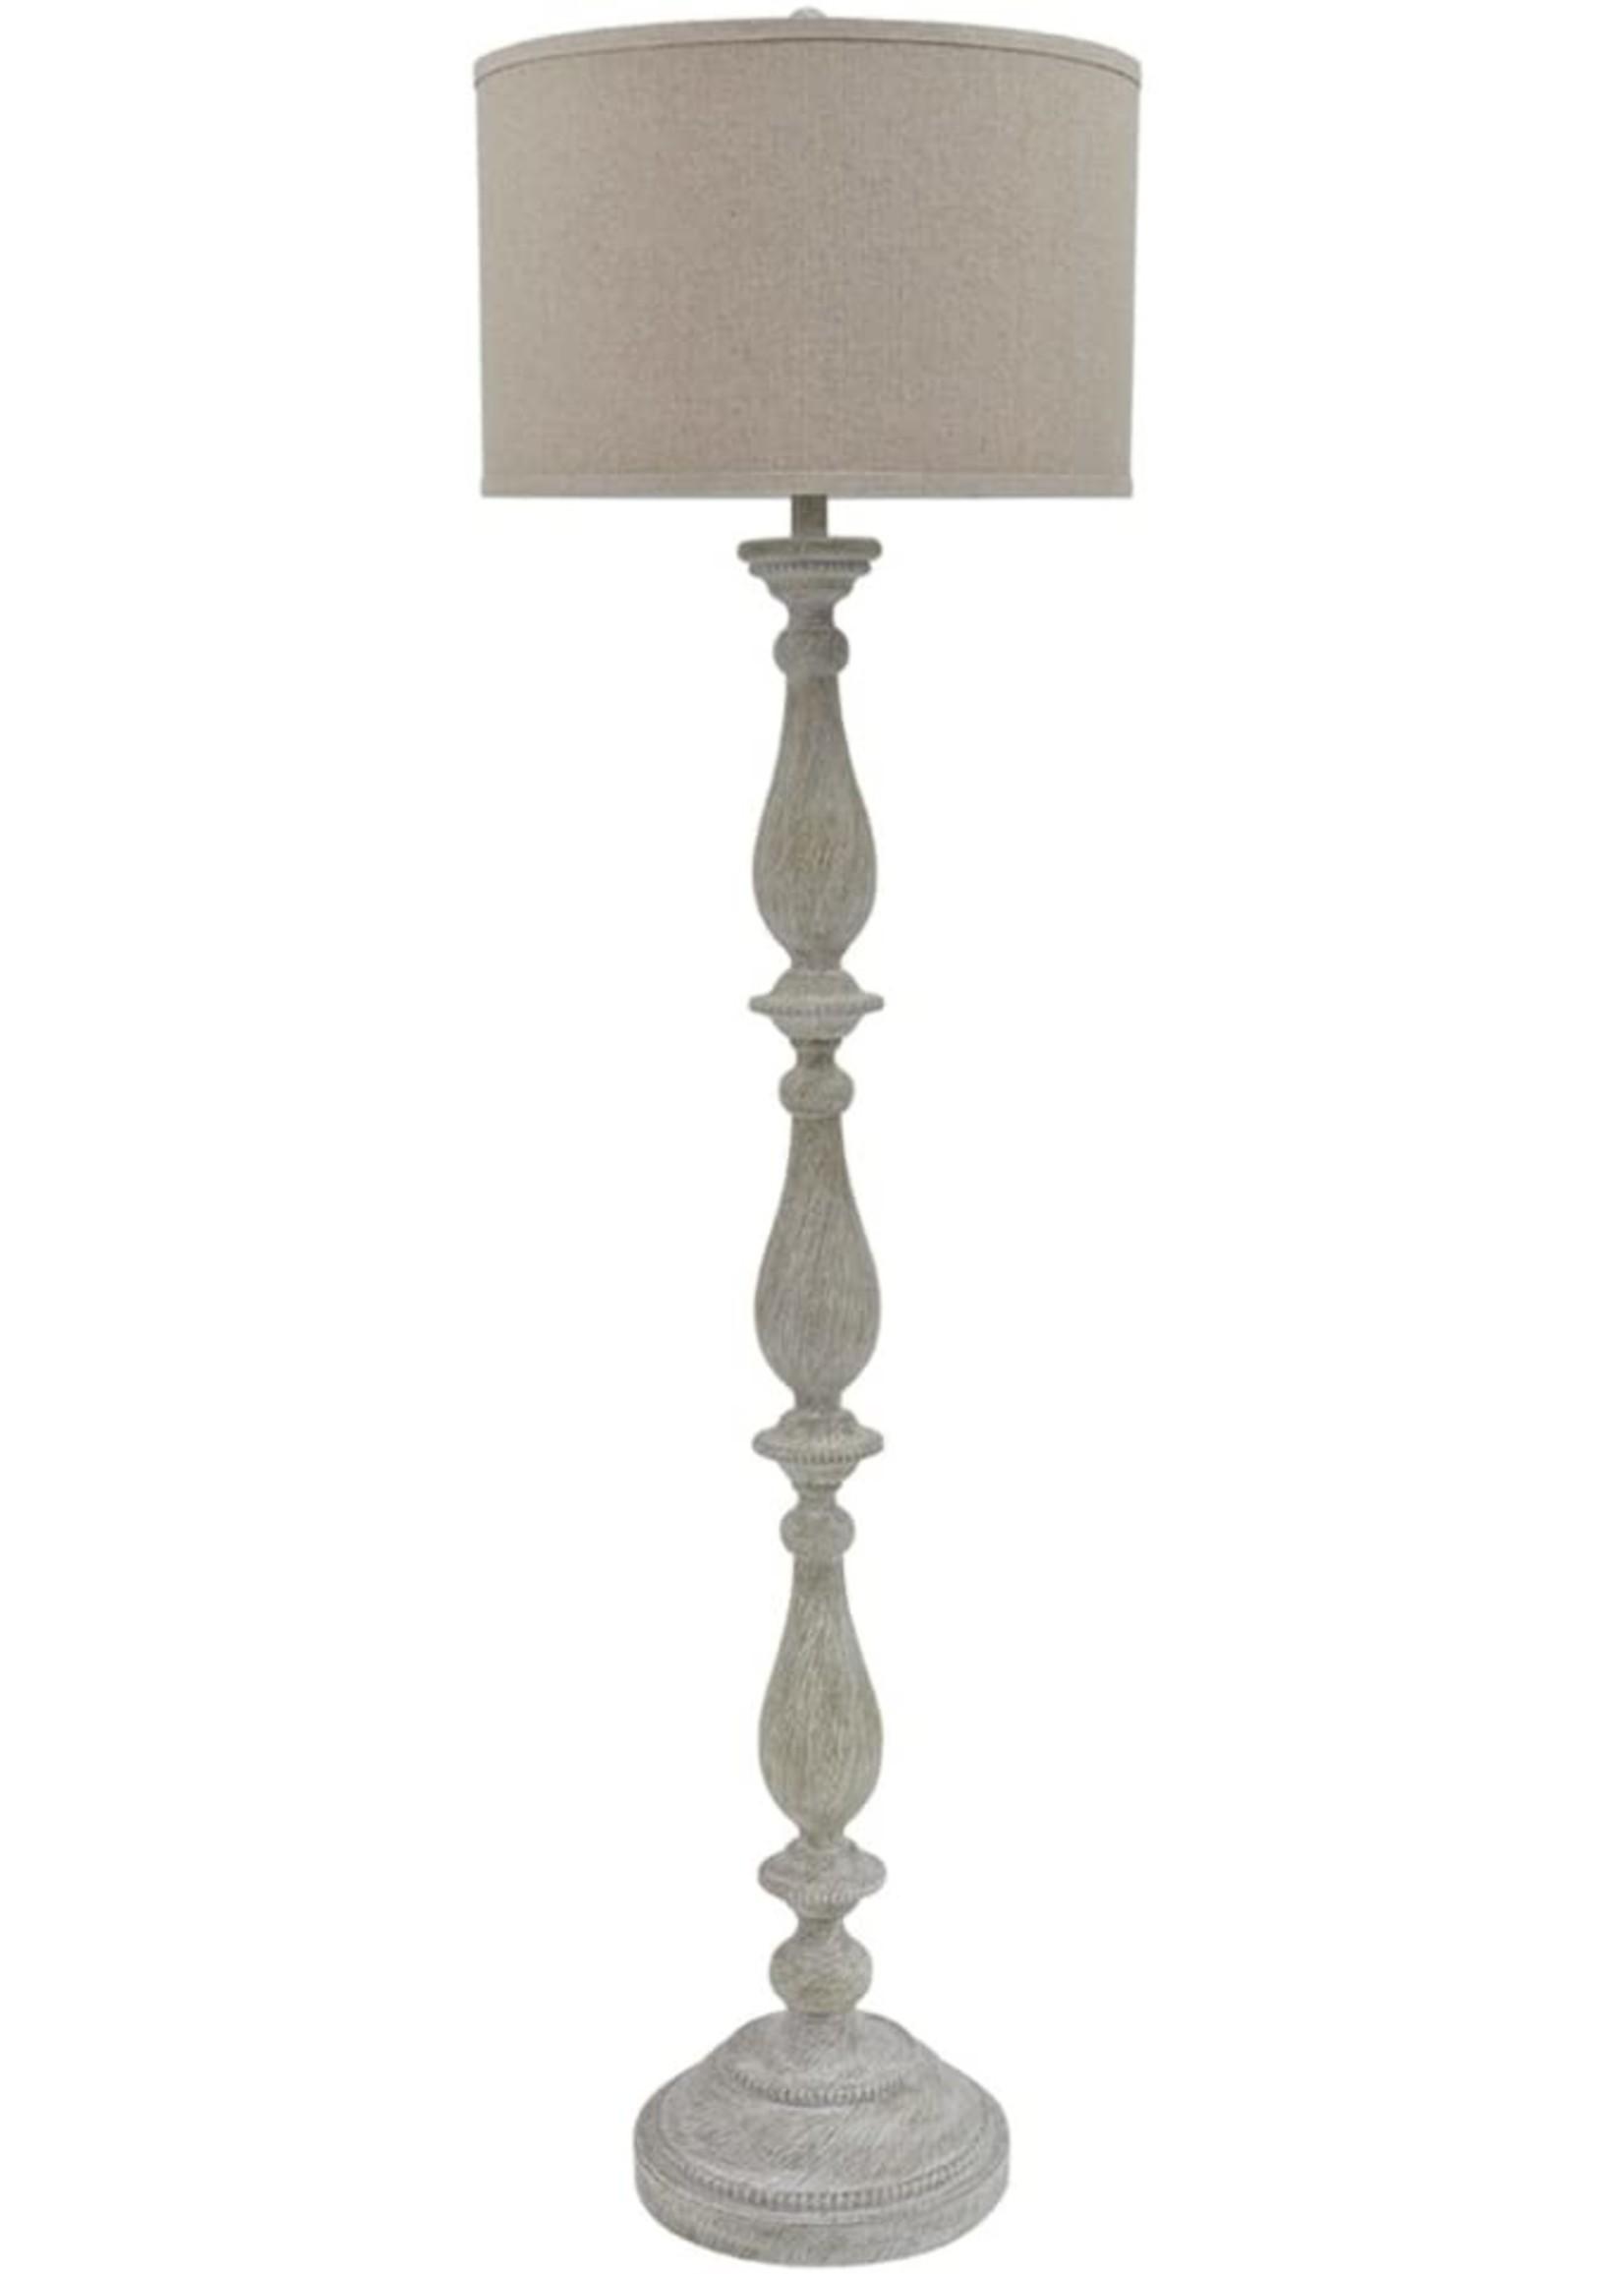 ASHLEY L235341 FLOOR LAMP BERNADATE WHITEWASH POLY